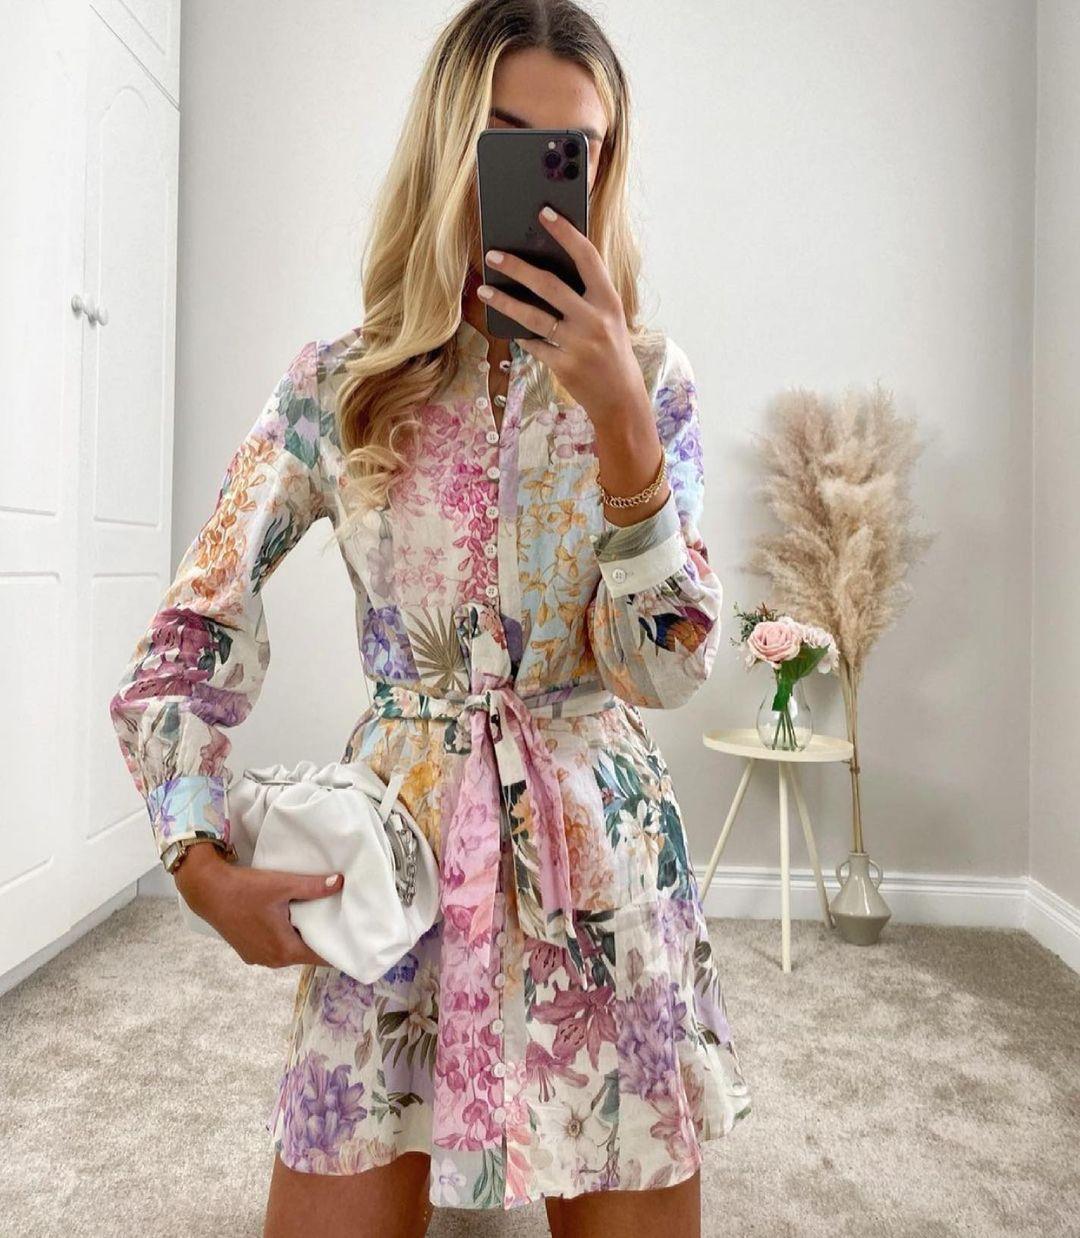 floral print dress de Zara sur zaraaddiction